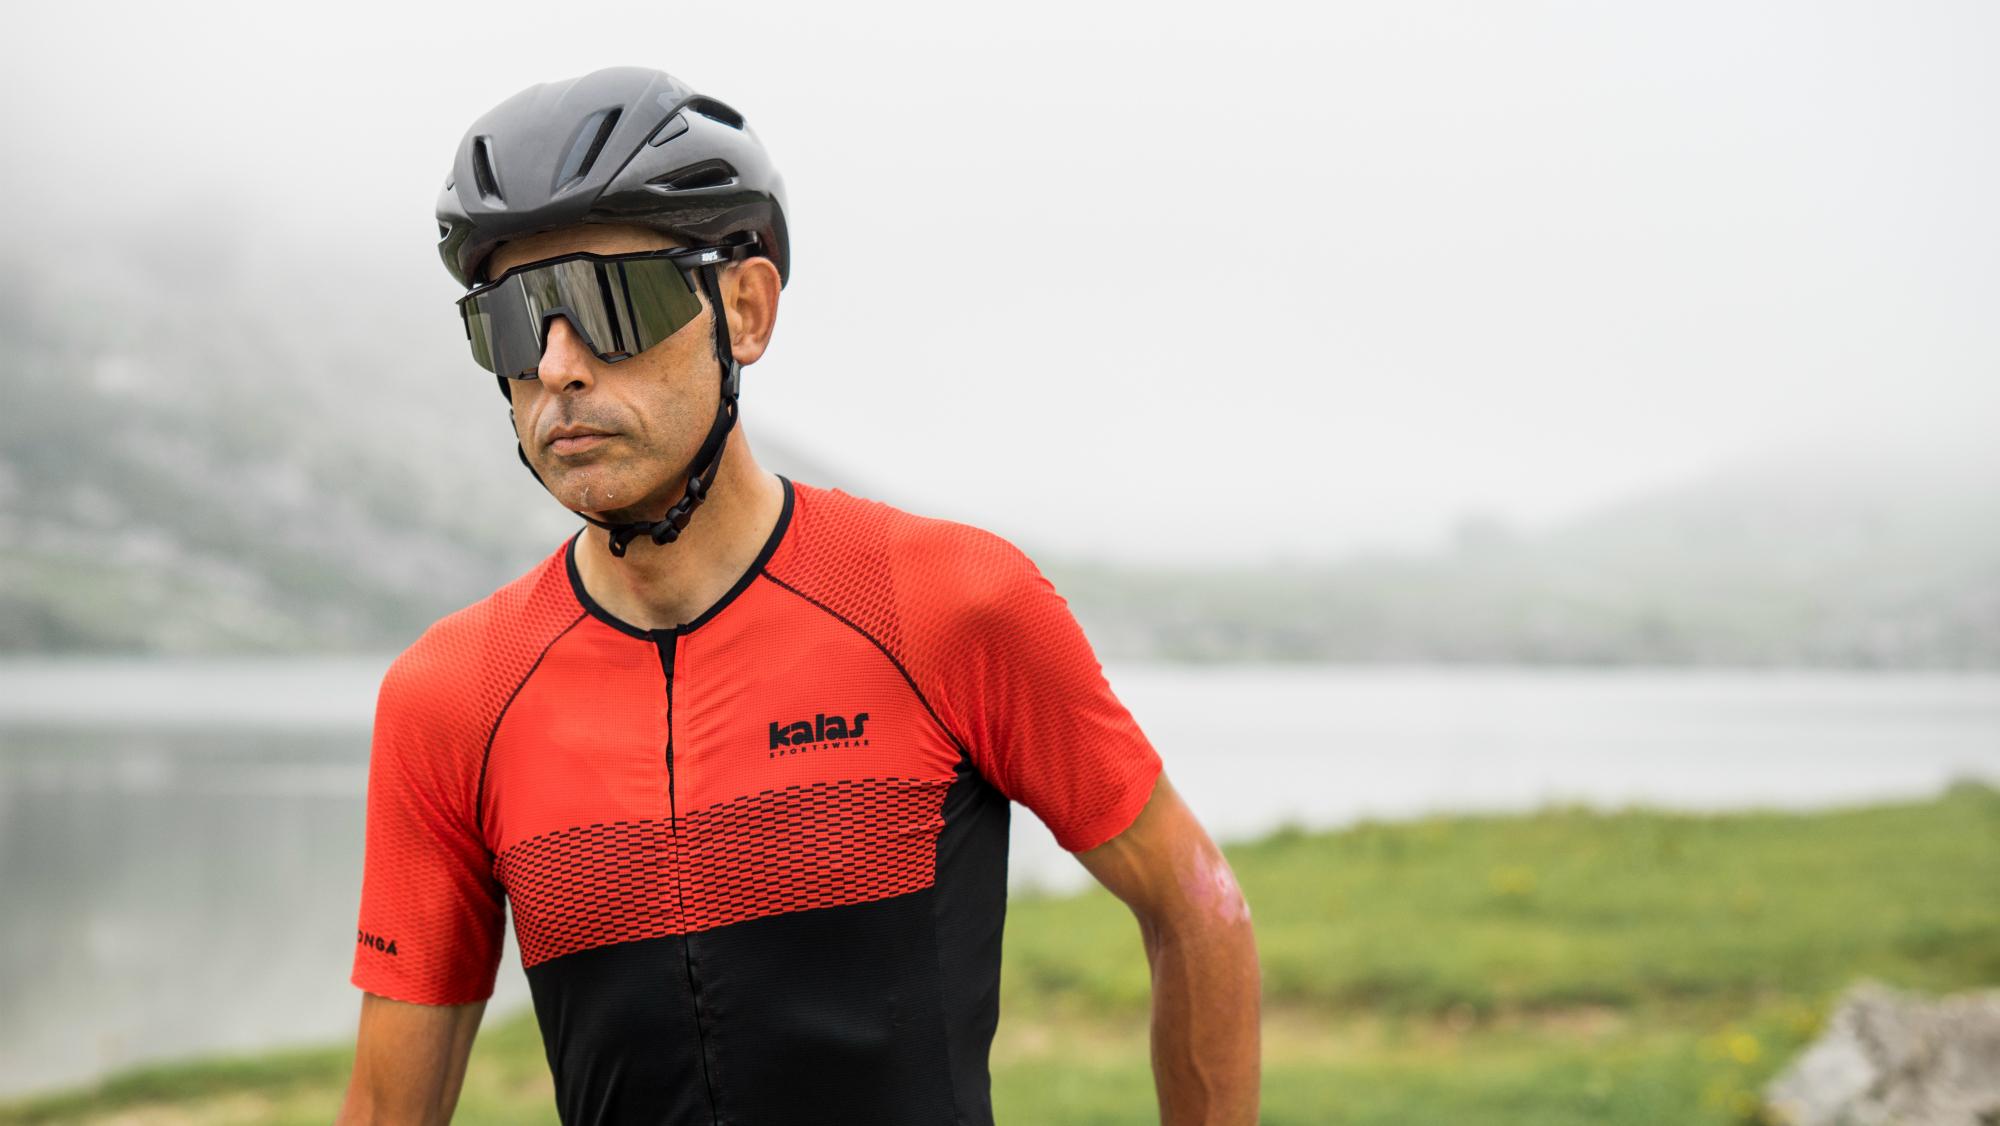 a cyclist stood wear the kalas covadonga jersey